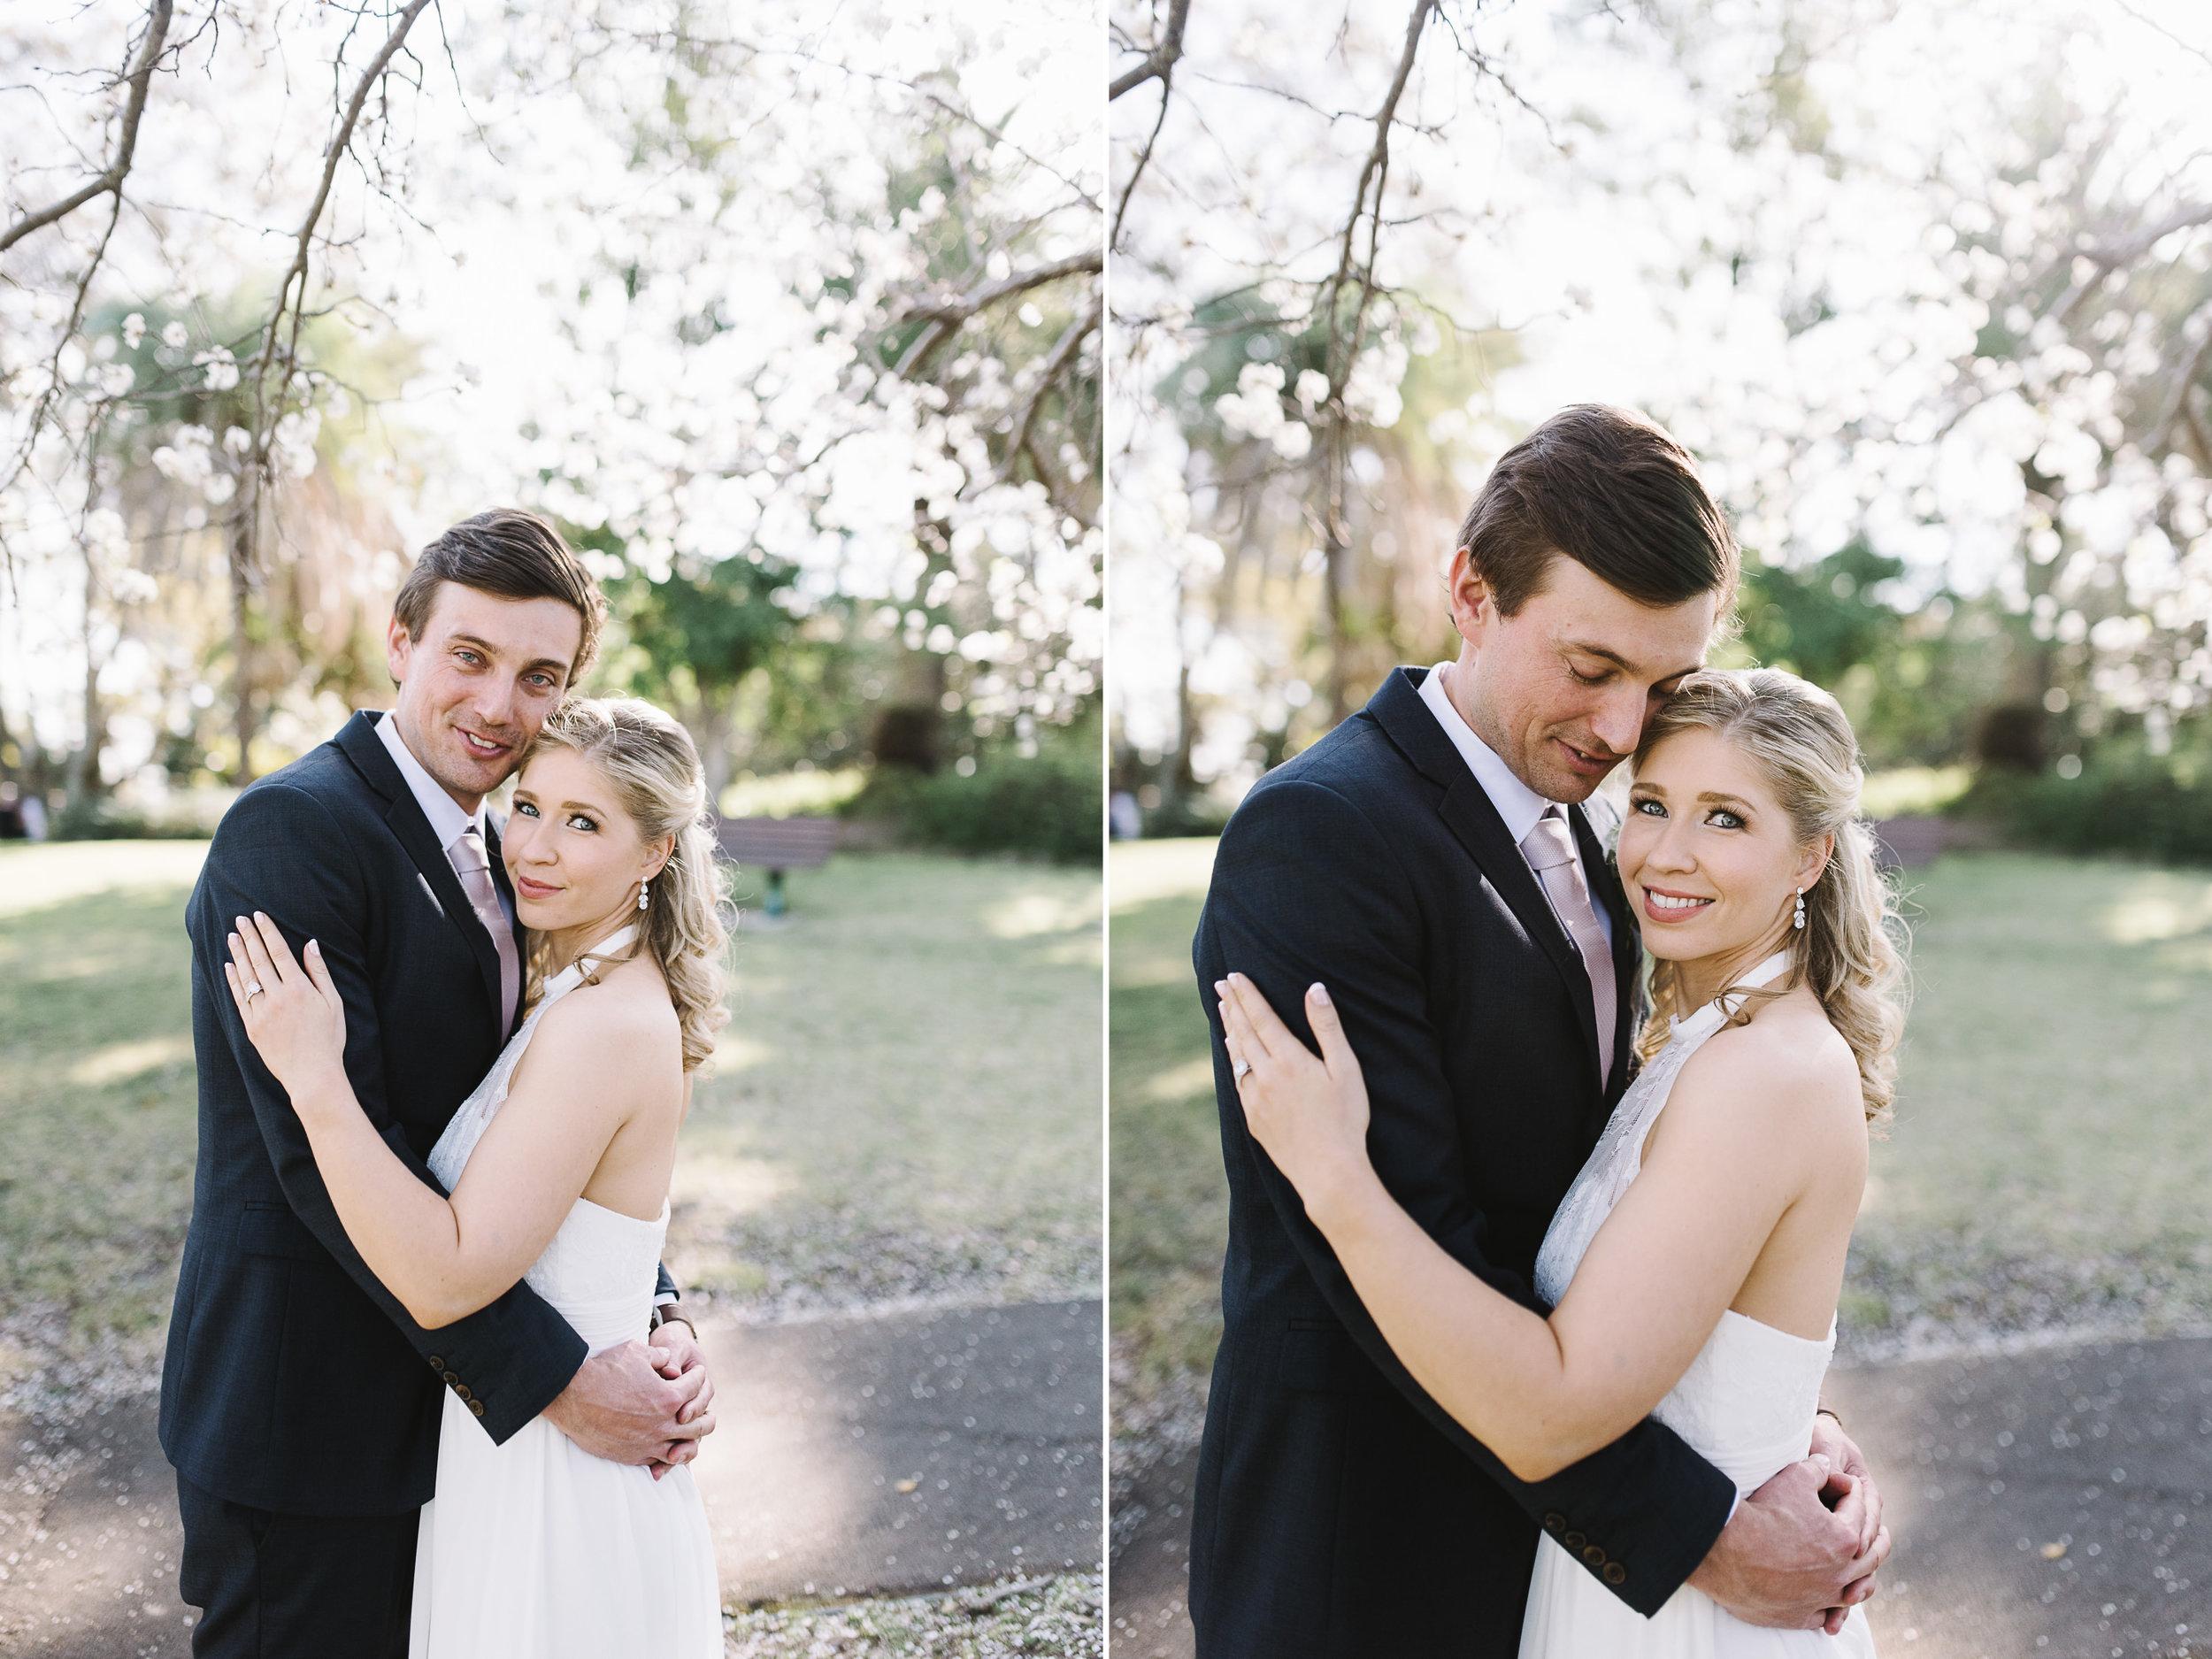 destination-wedding-photography-1.jpg